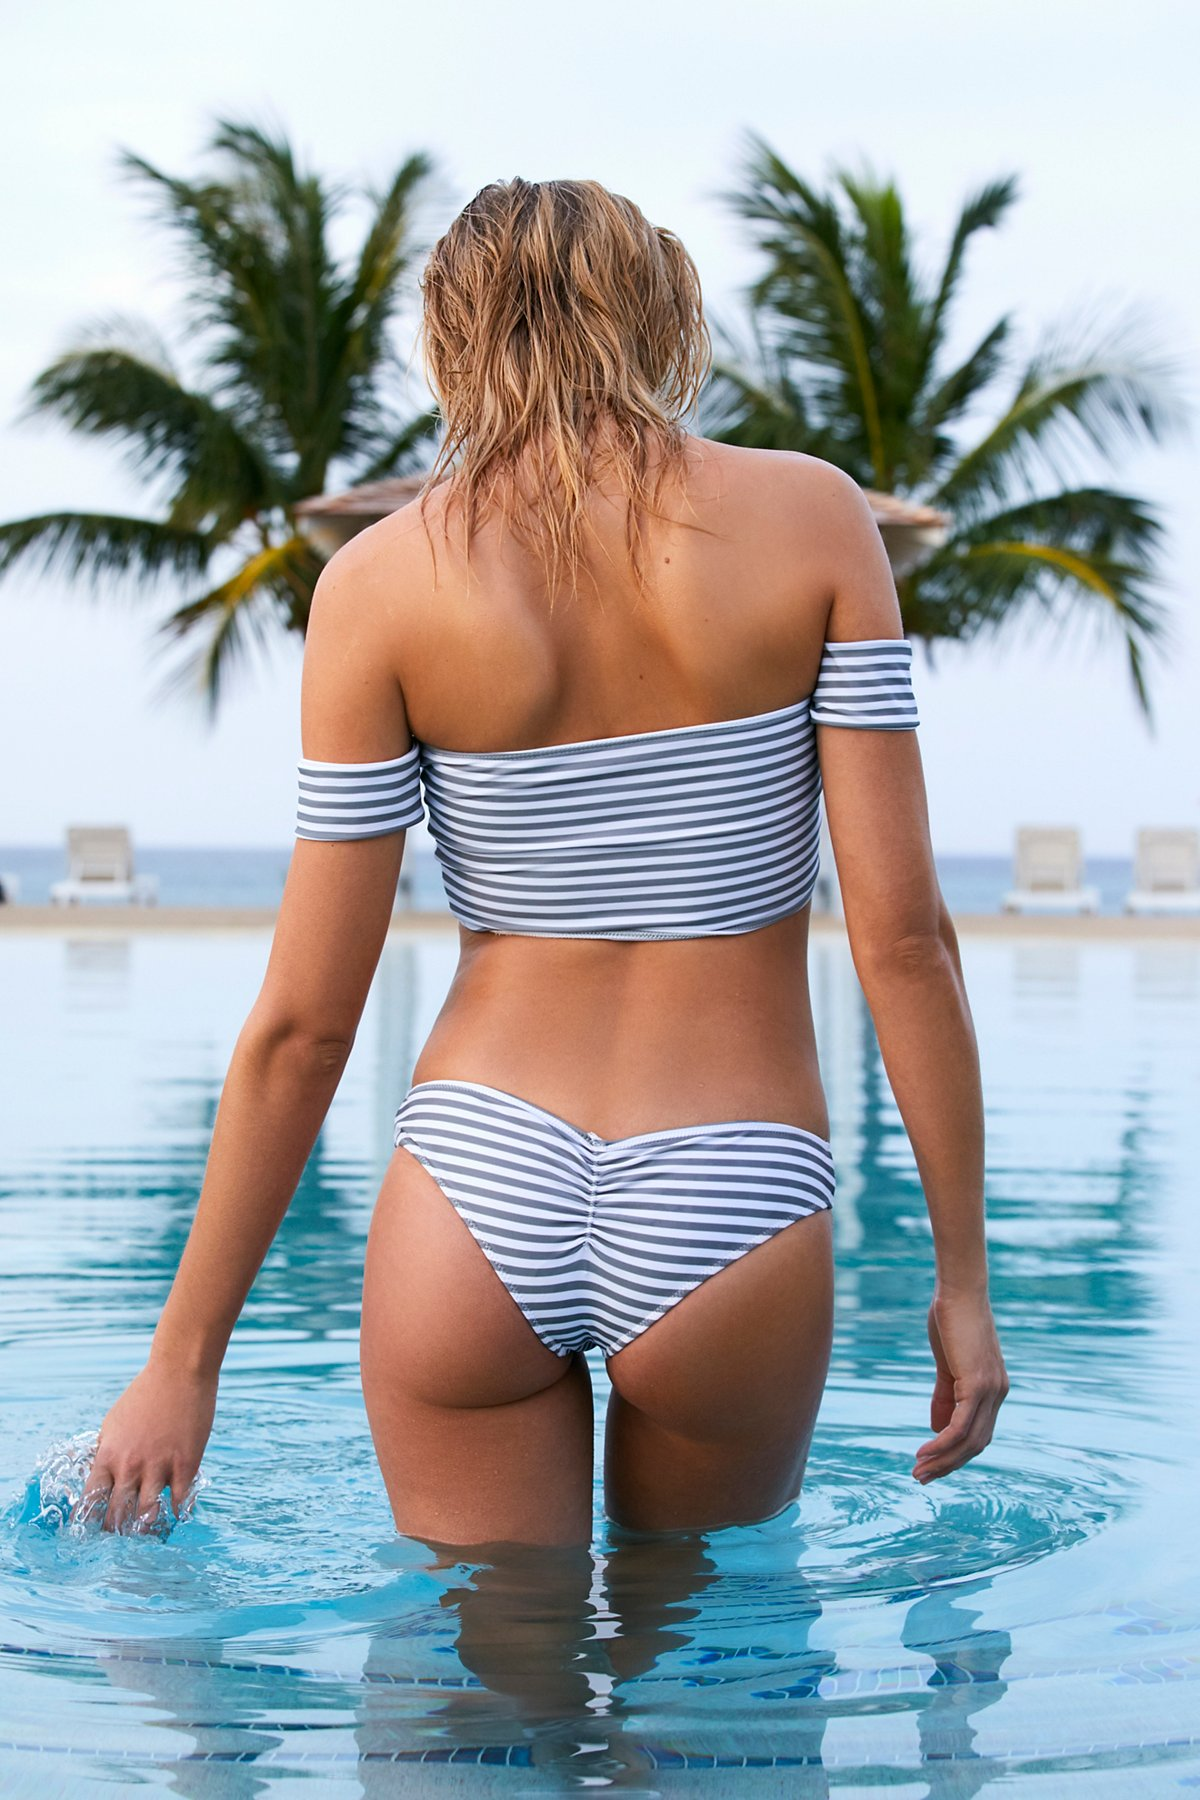 Nikki条纹比基尼泳裤